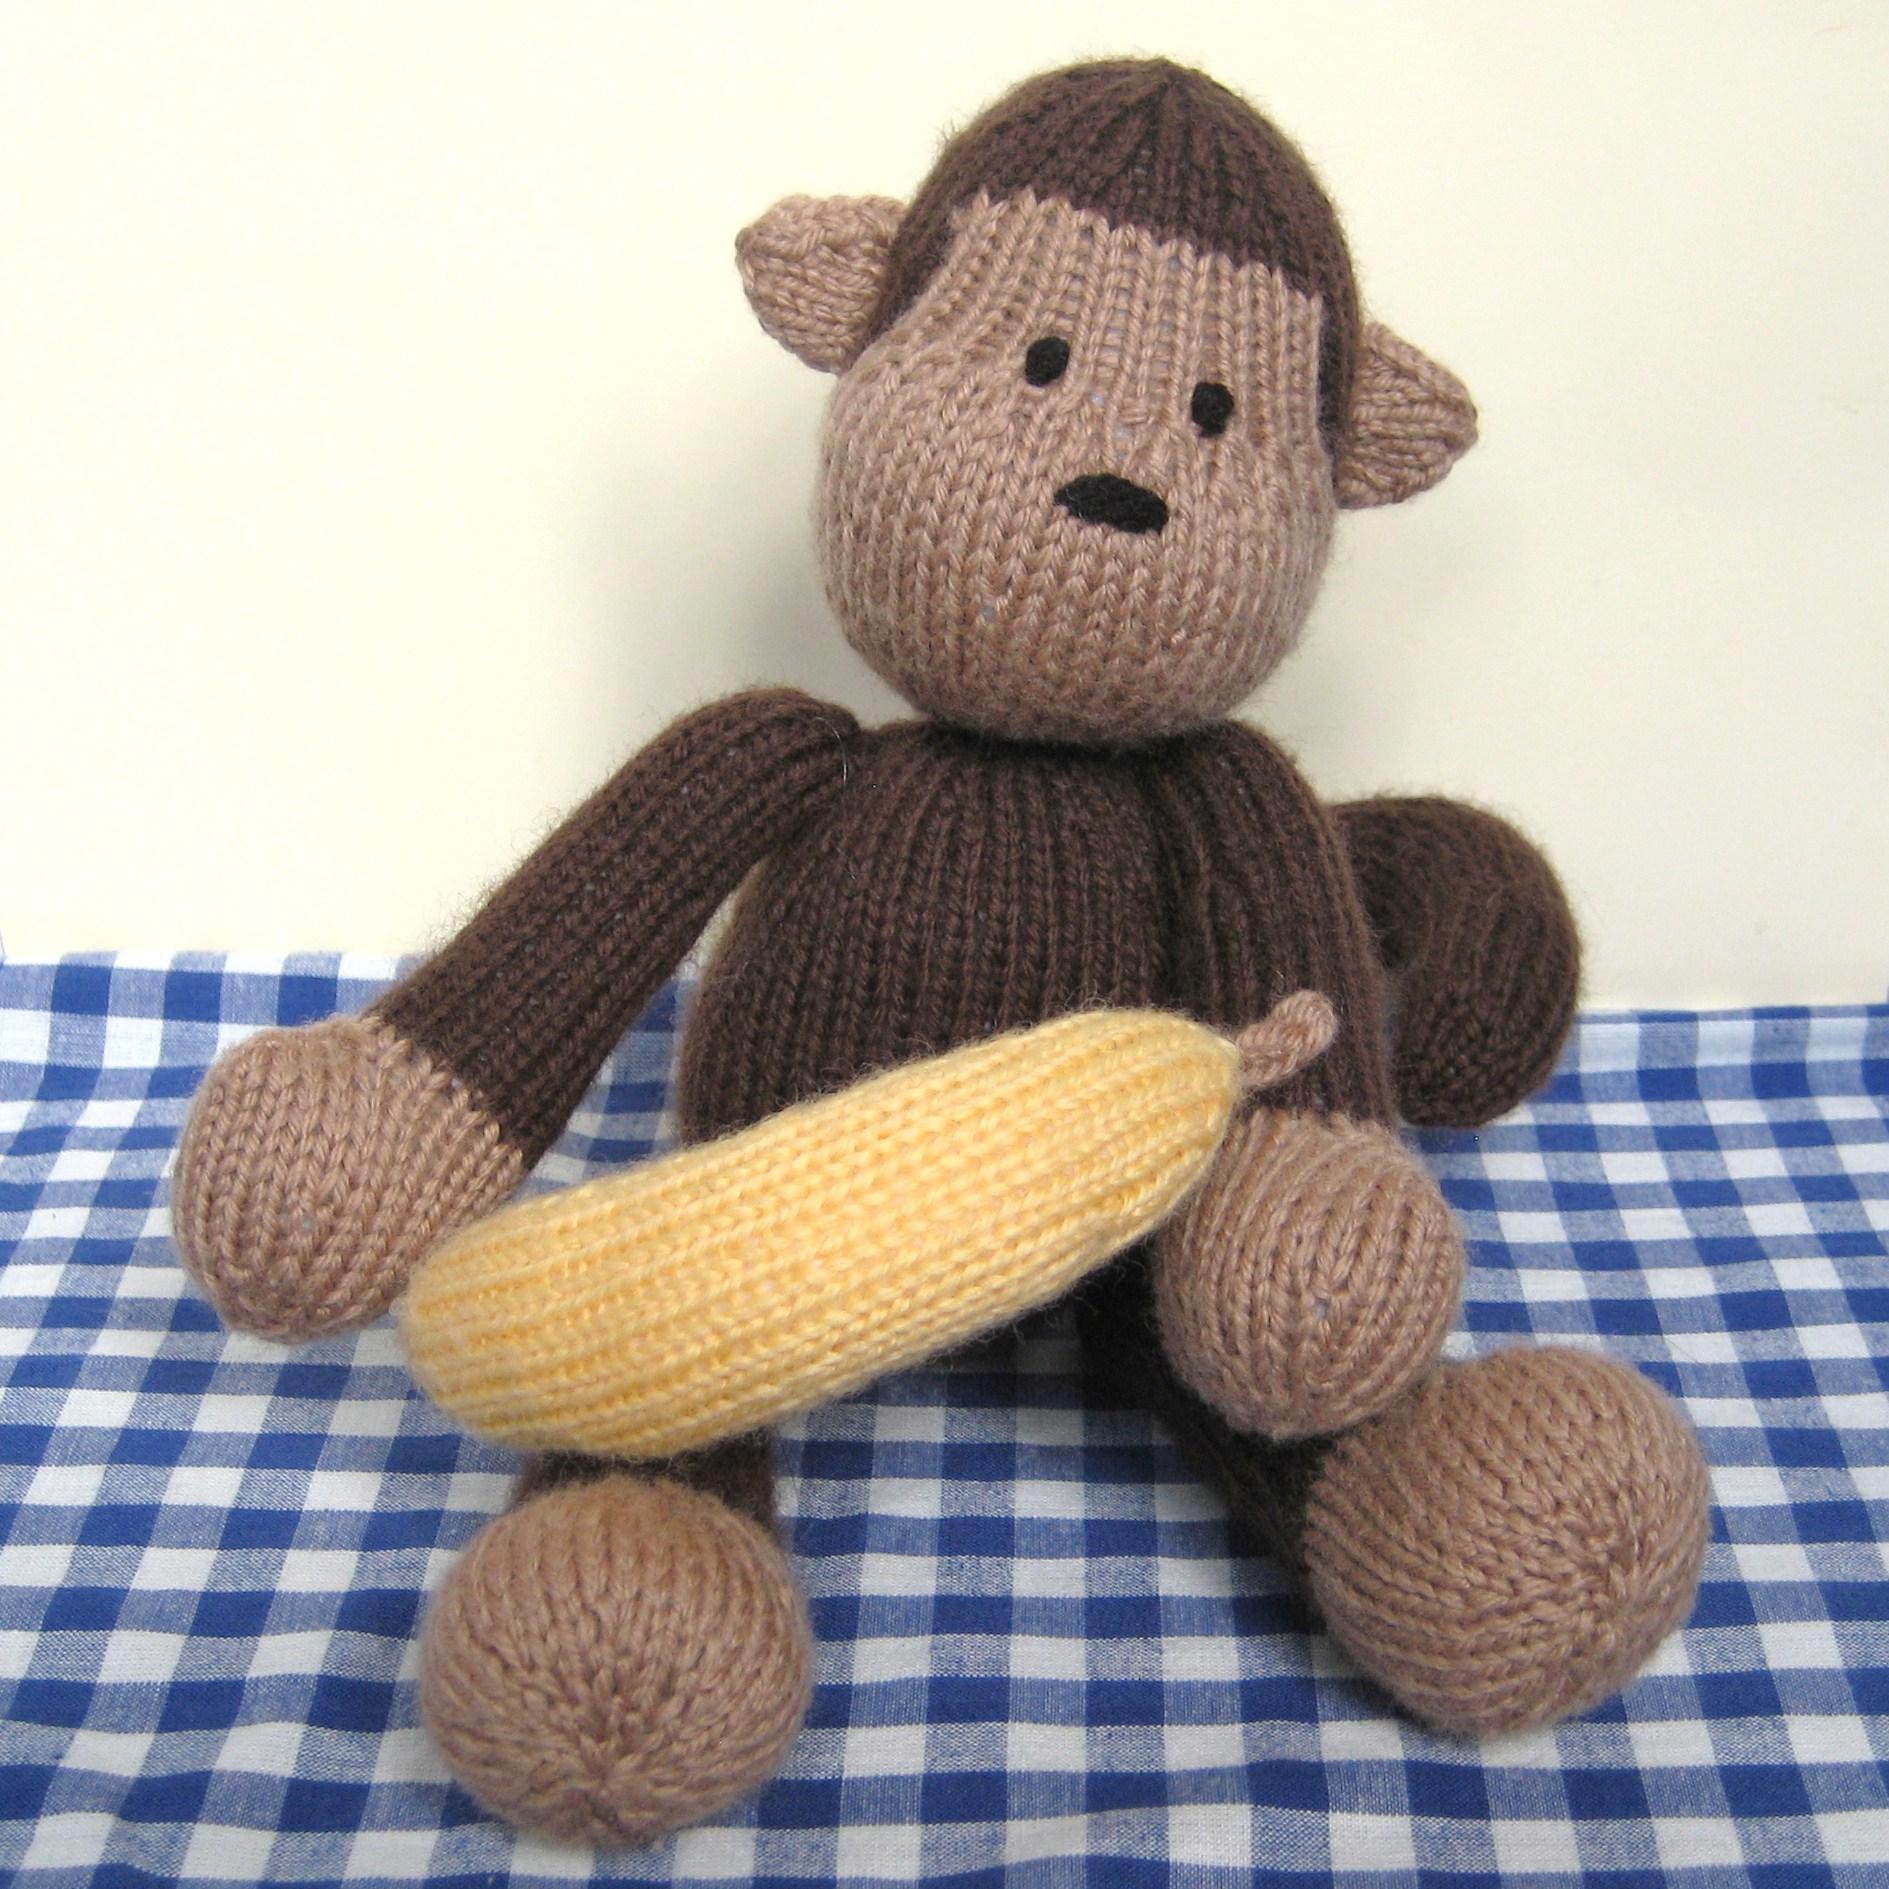 Free Knitting Patterns Toy Monkey : Norwood monkey knitting pattern